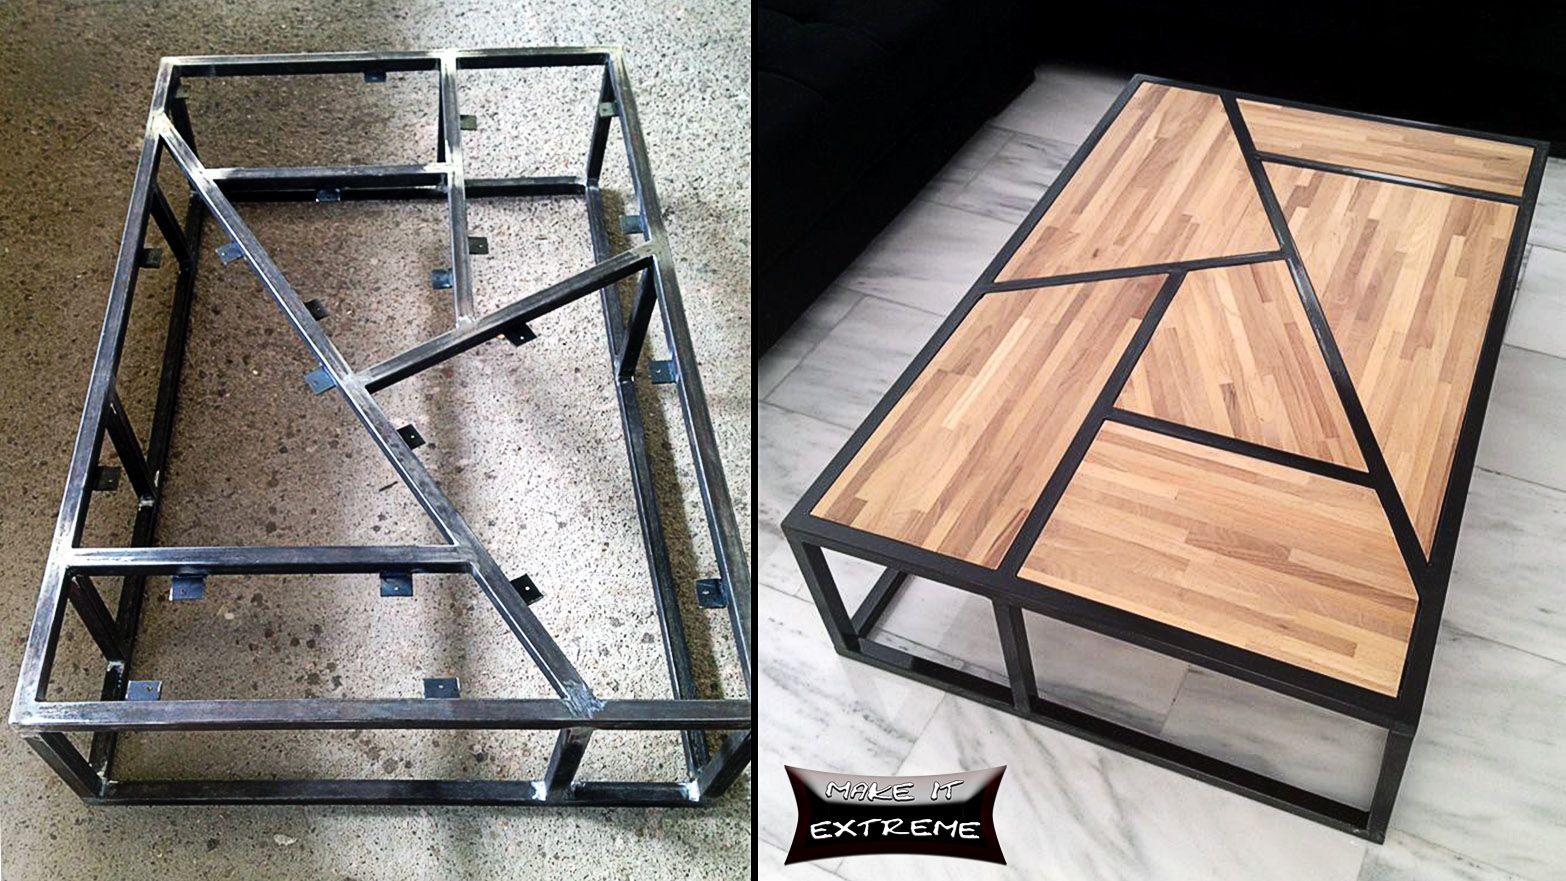 beautiful coffee table ozdabianie rearanżacje mieszkań on stunning wooden metal coffee table id=27788